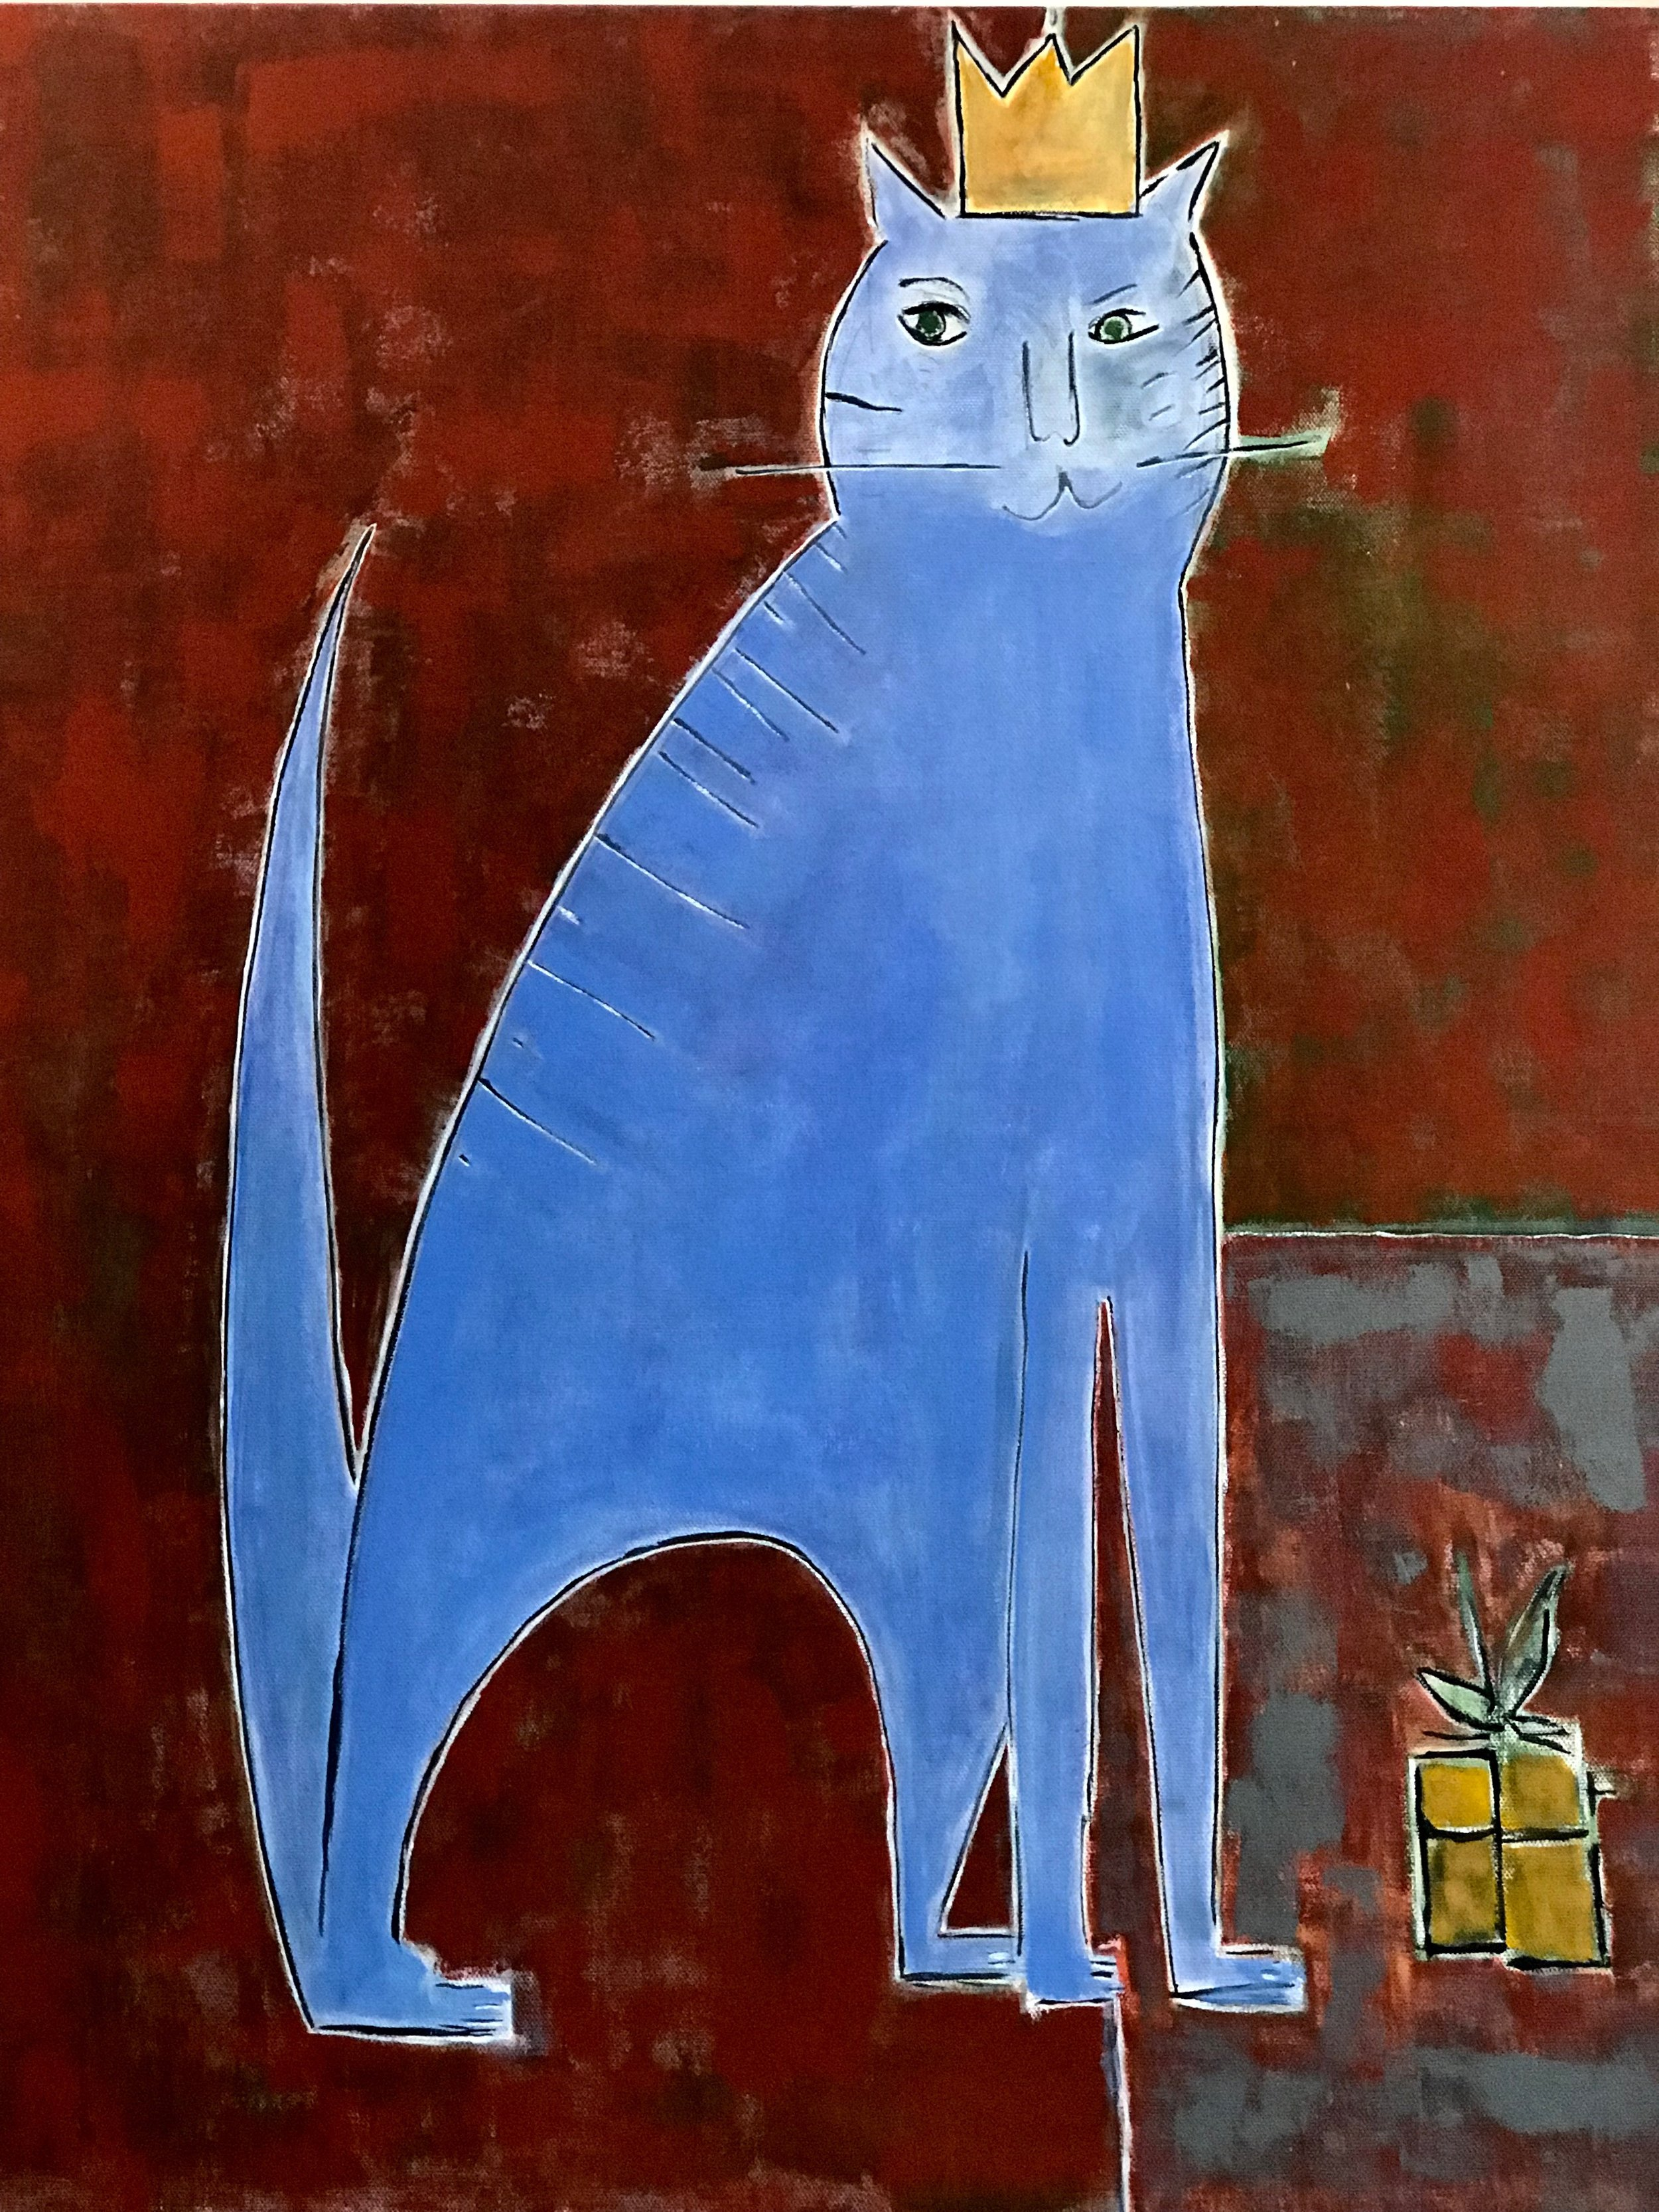 Cat Awaits Her Present, by Kate Razo